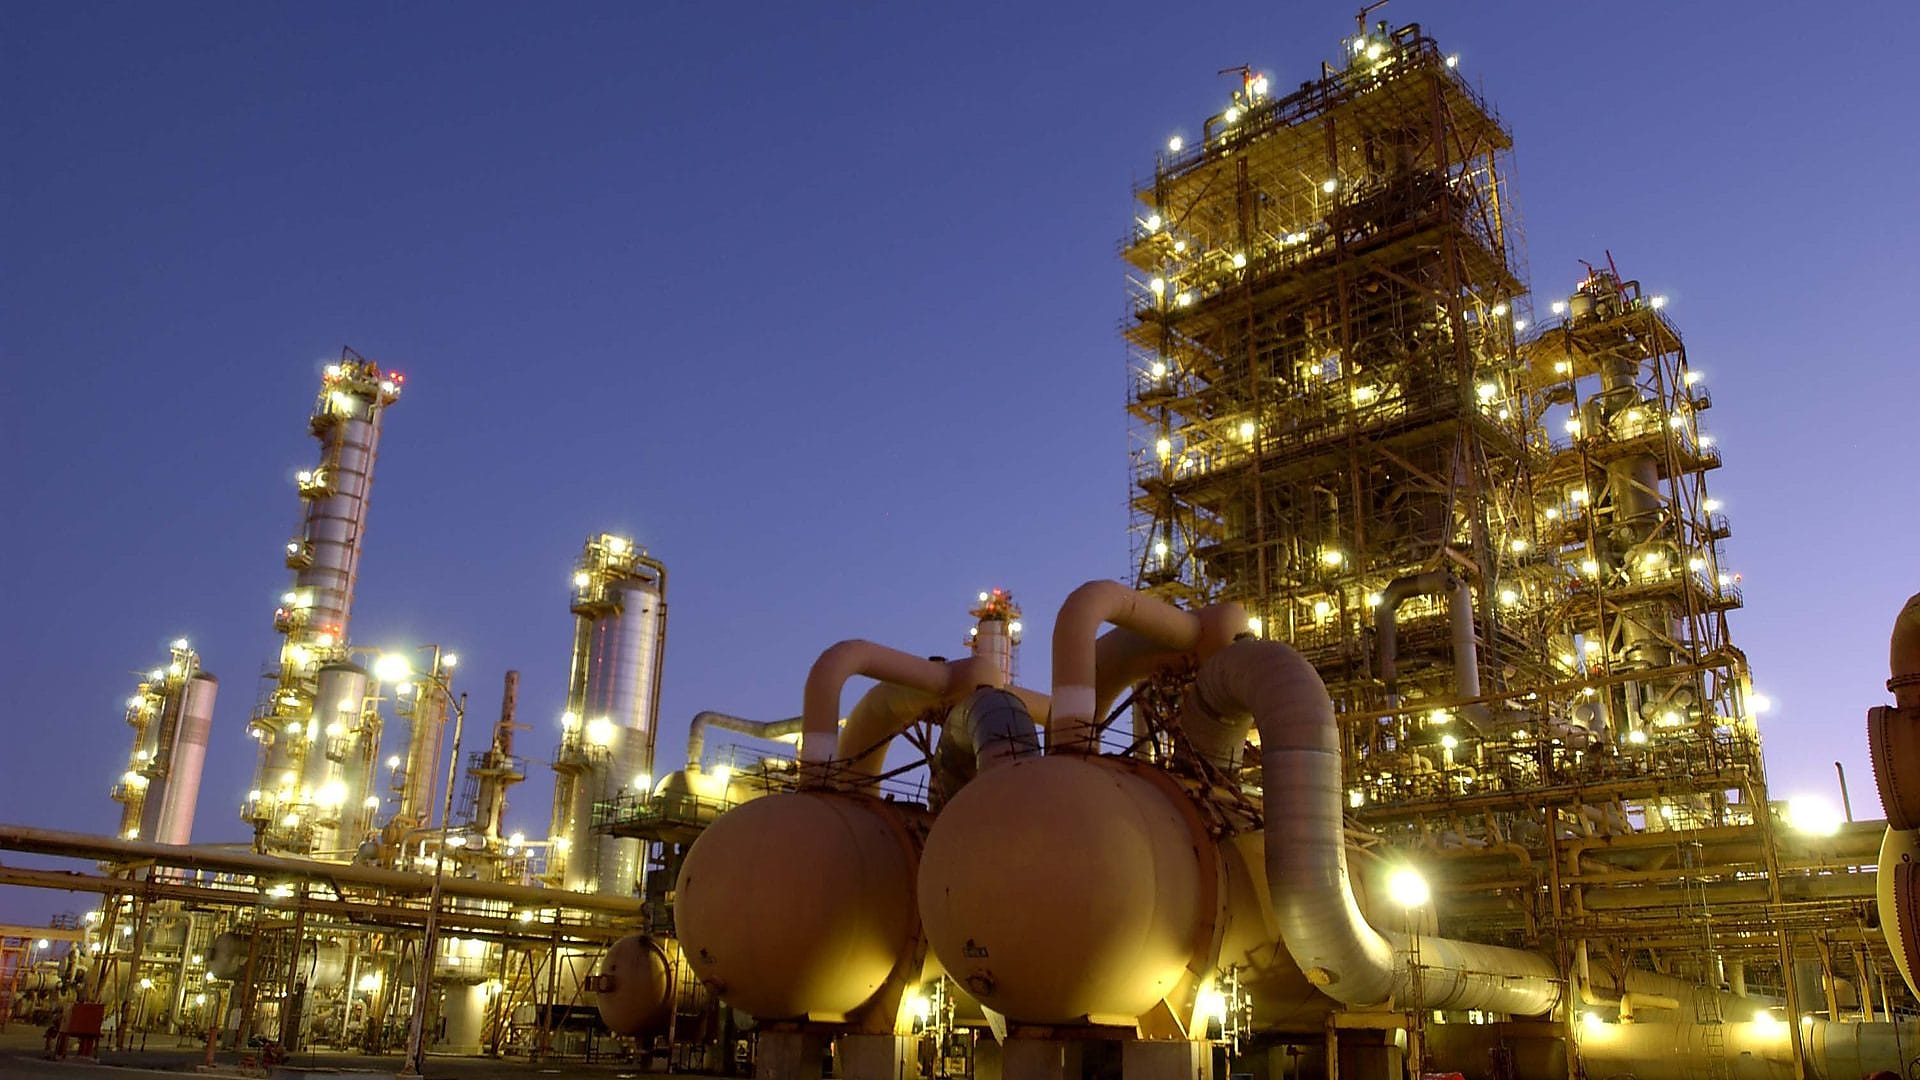 Penske Near Me >> Shell Trading (US) Company- Lease Administration | Shell ...